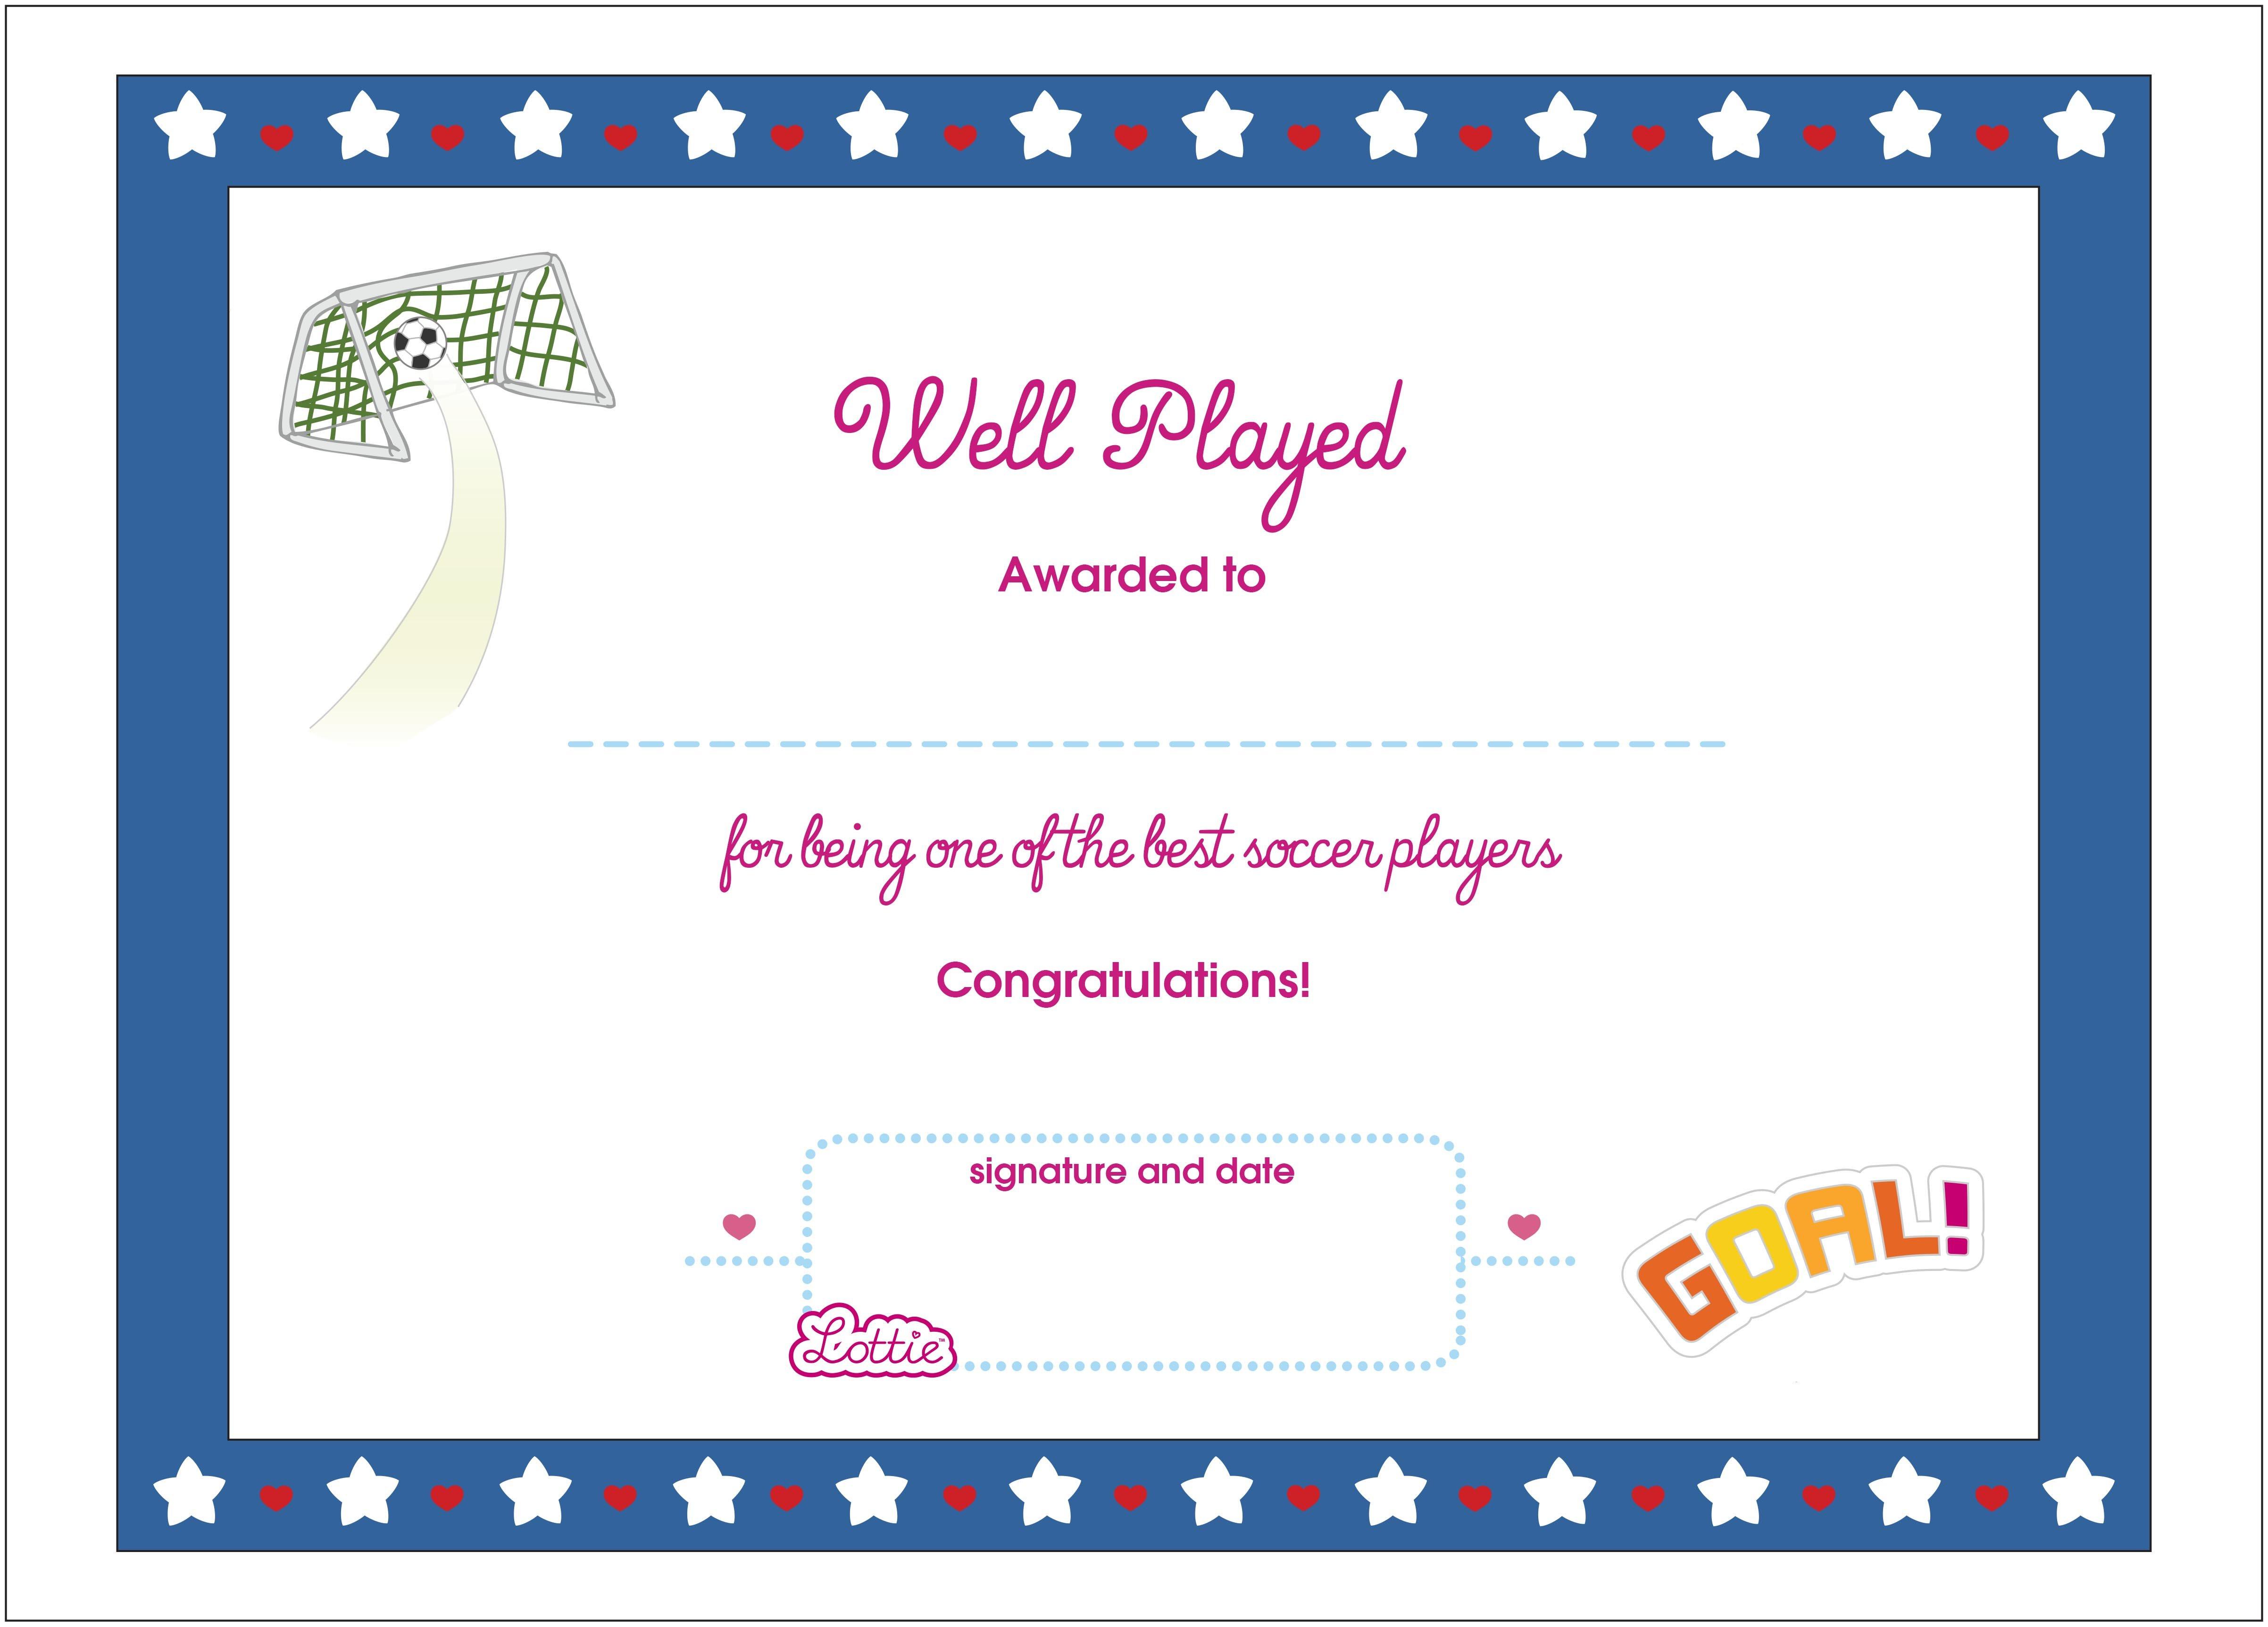 Soccer Printable Award Certificate (Us Spelling) – Lottie Dolls - Free Soccer Award Certificates Printable